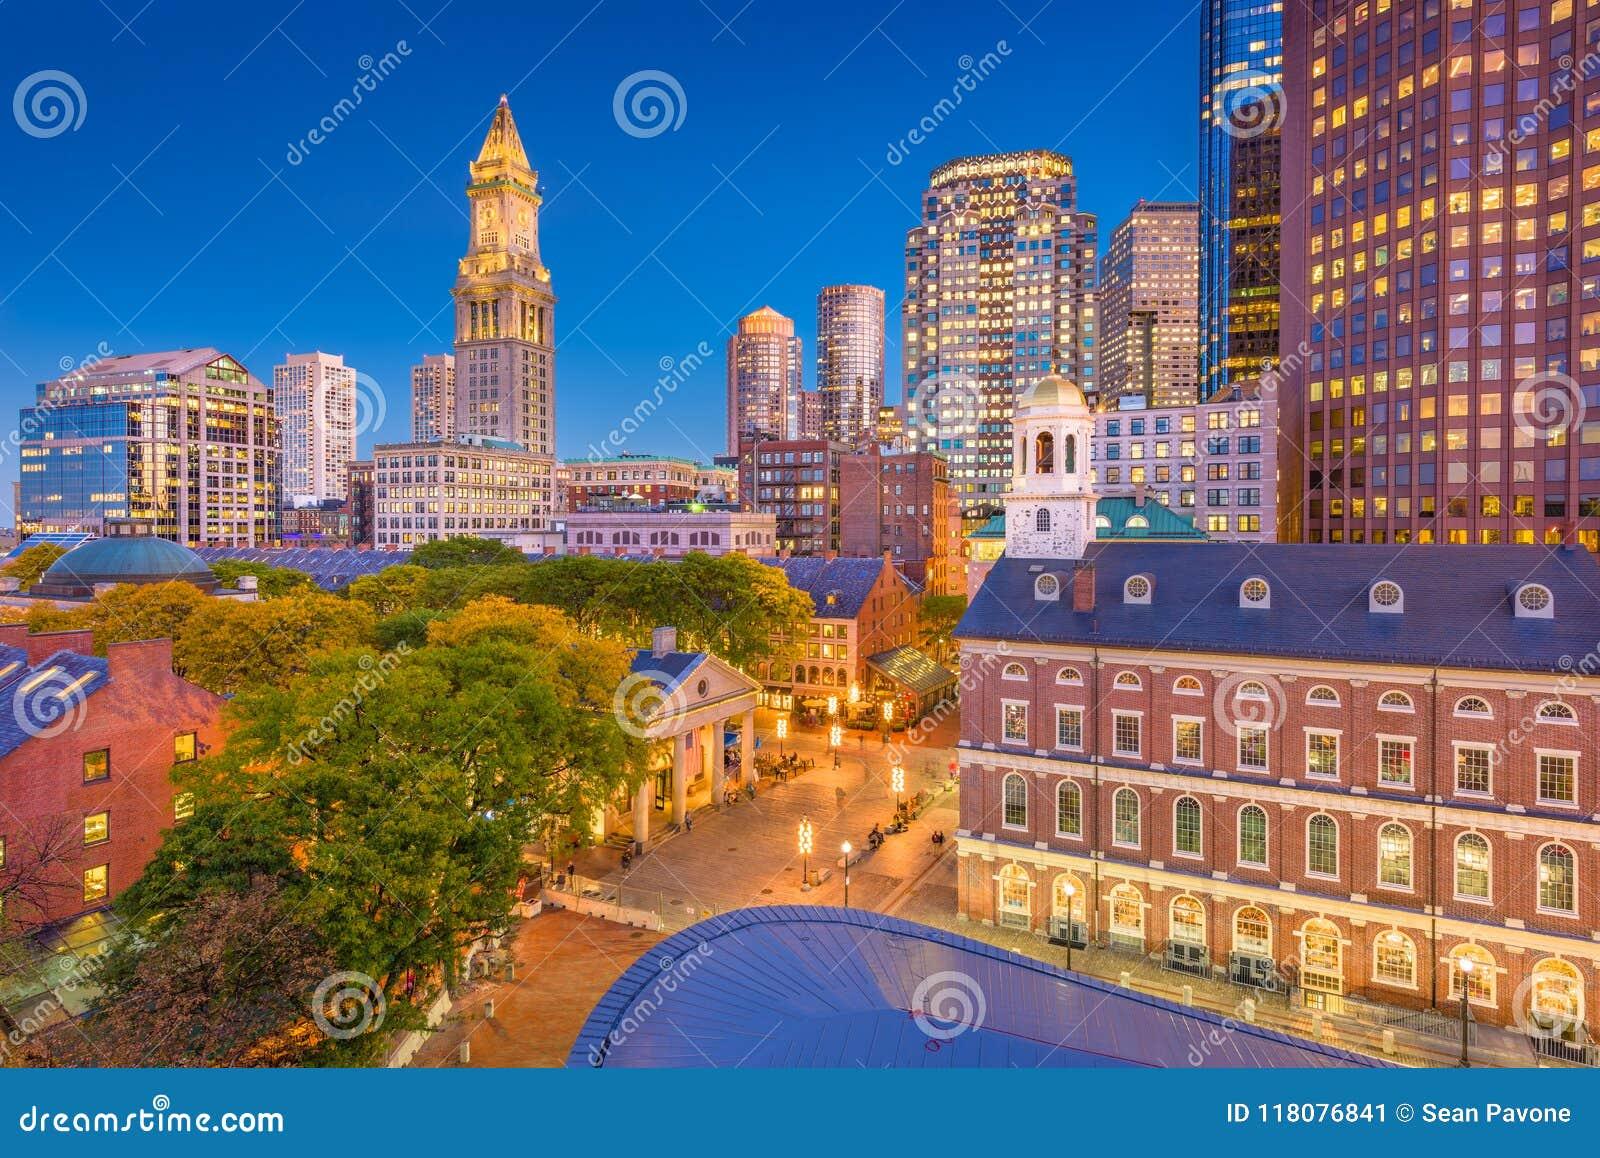 Paisaje urbano de Boston, Massachusetts, los E.E.U.U.